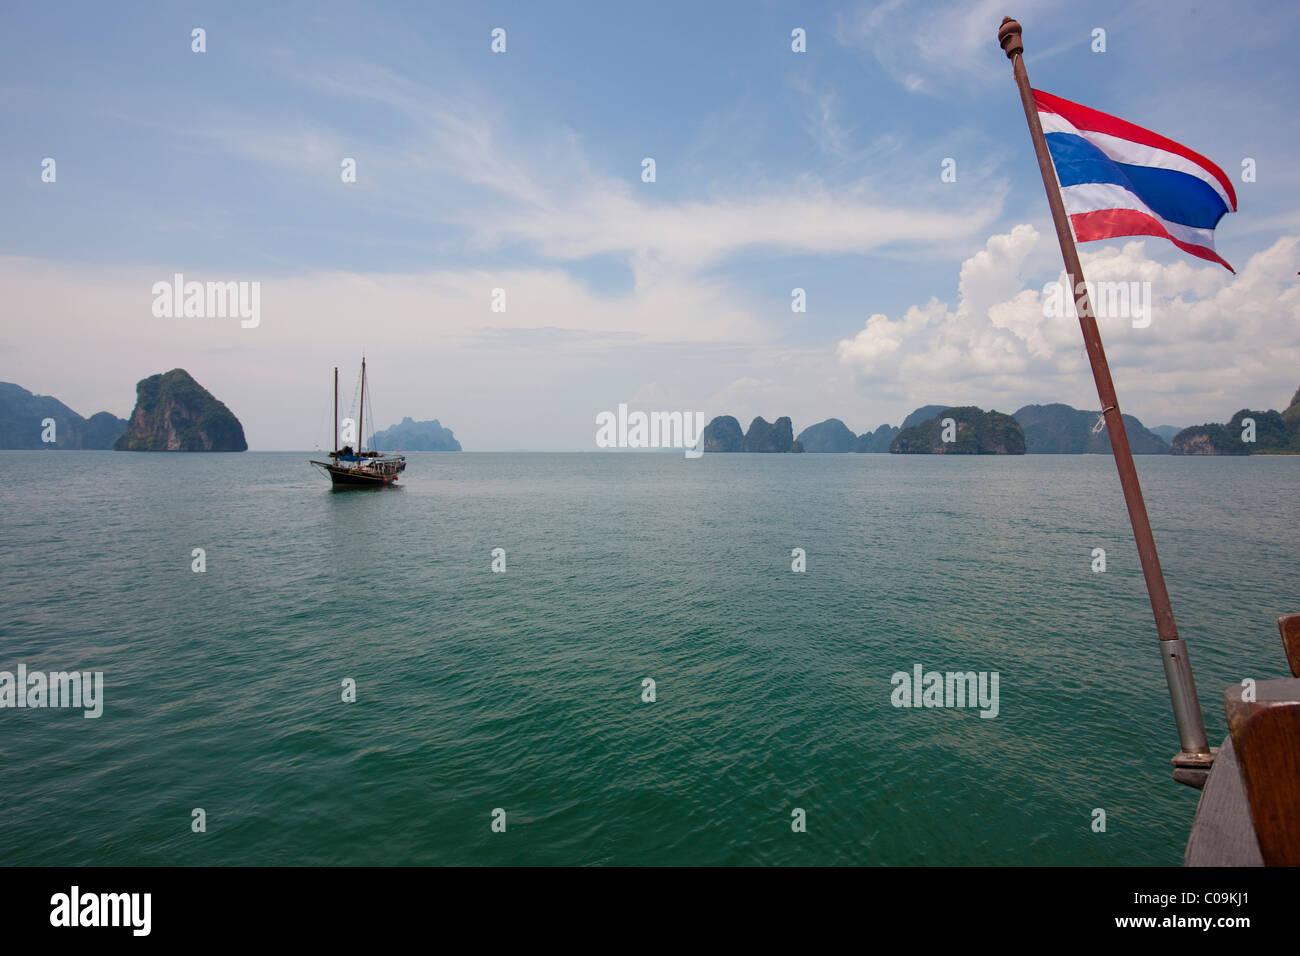 Junk in the Phang Nga Bay, Phuket, Thailand, Asia - Stock Image